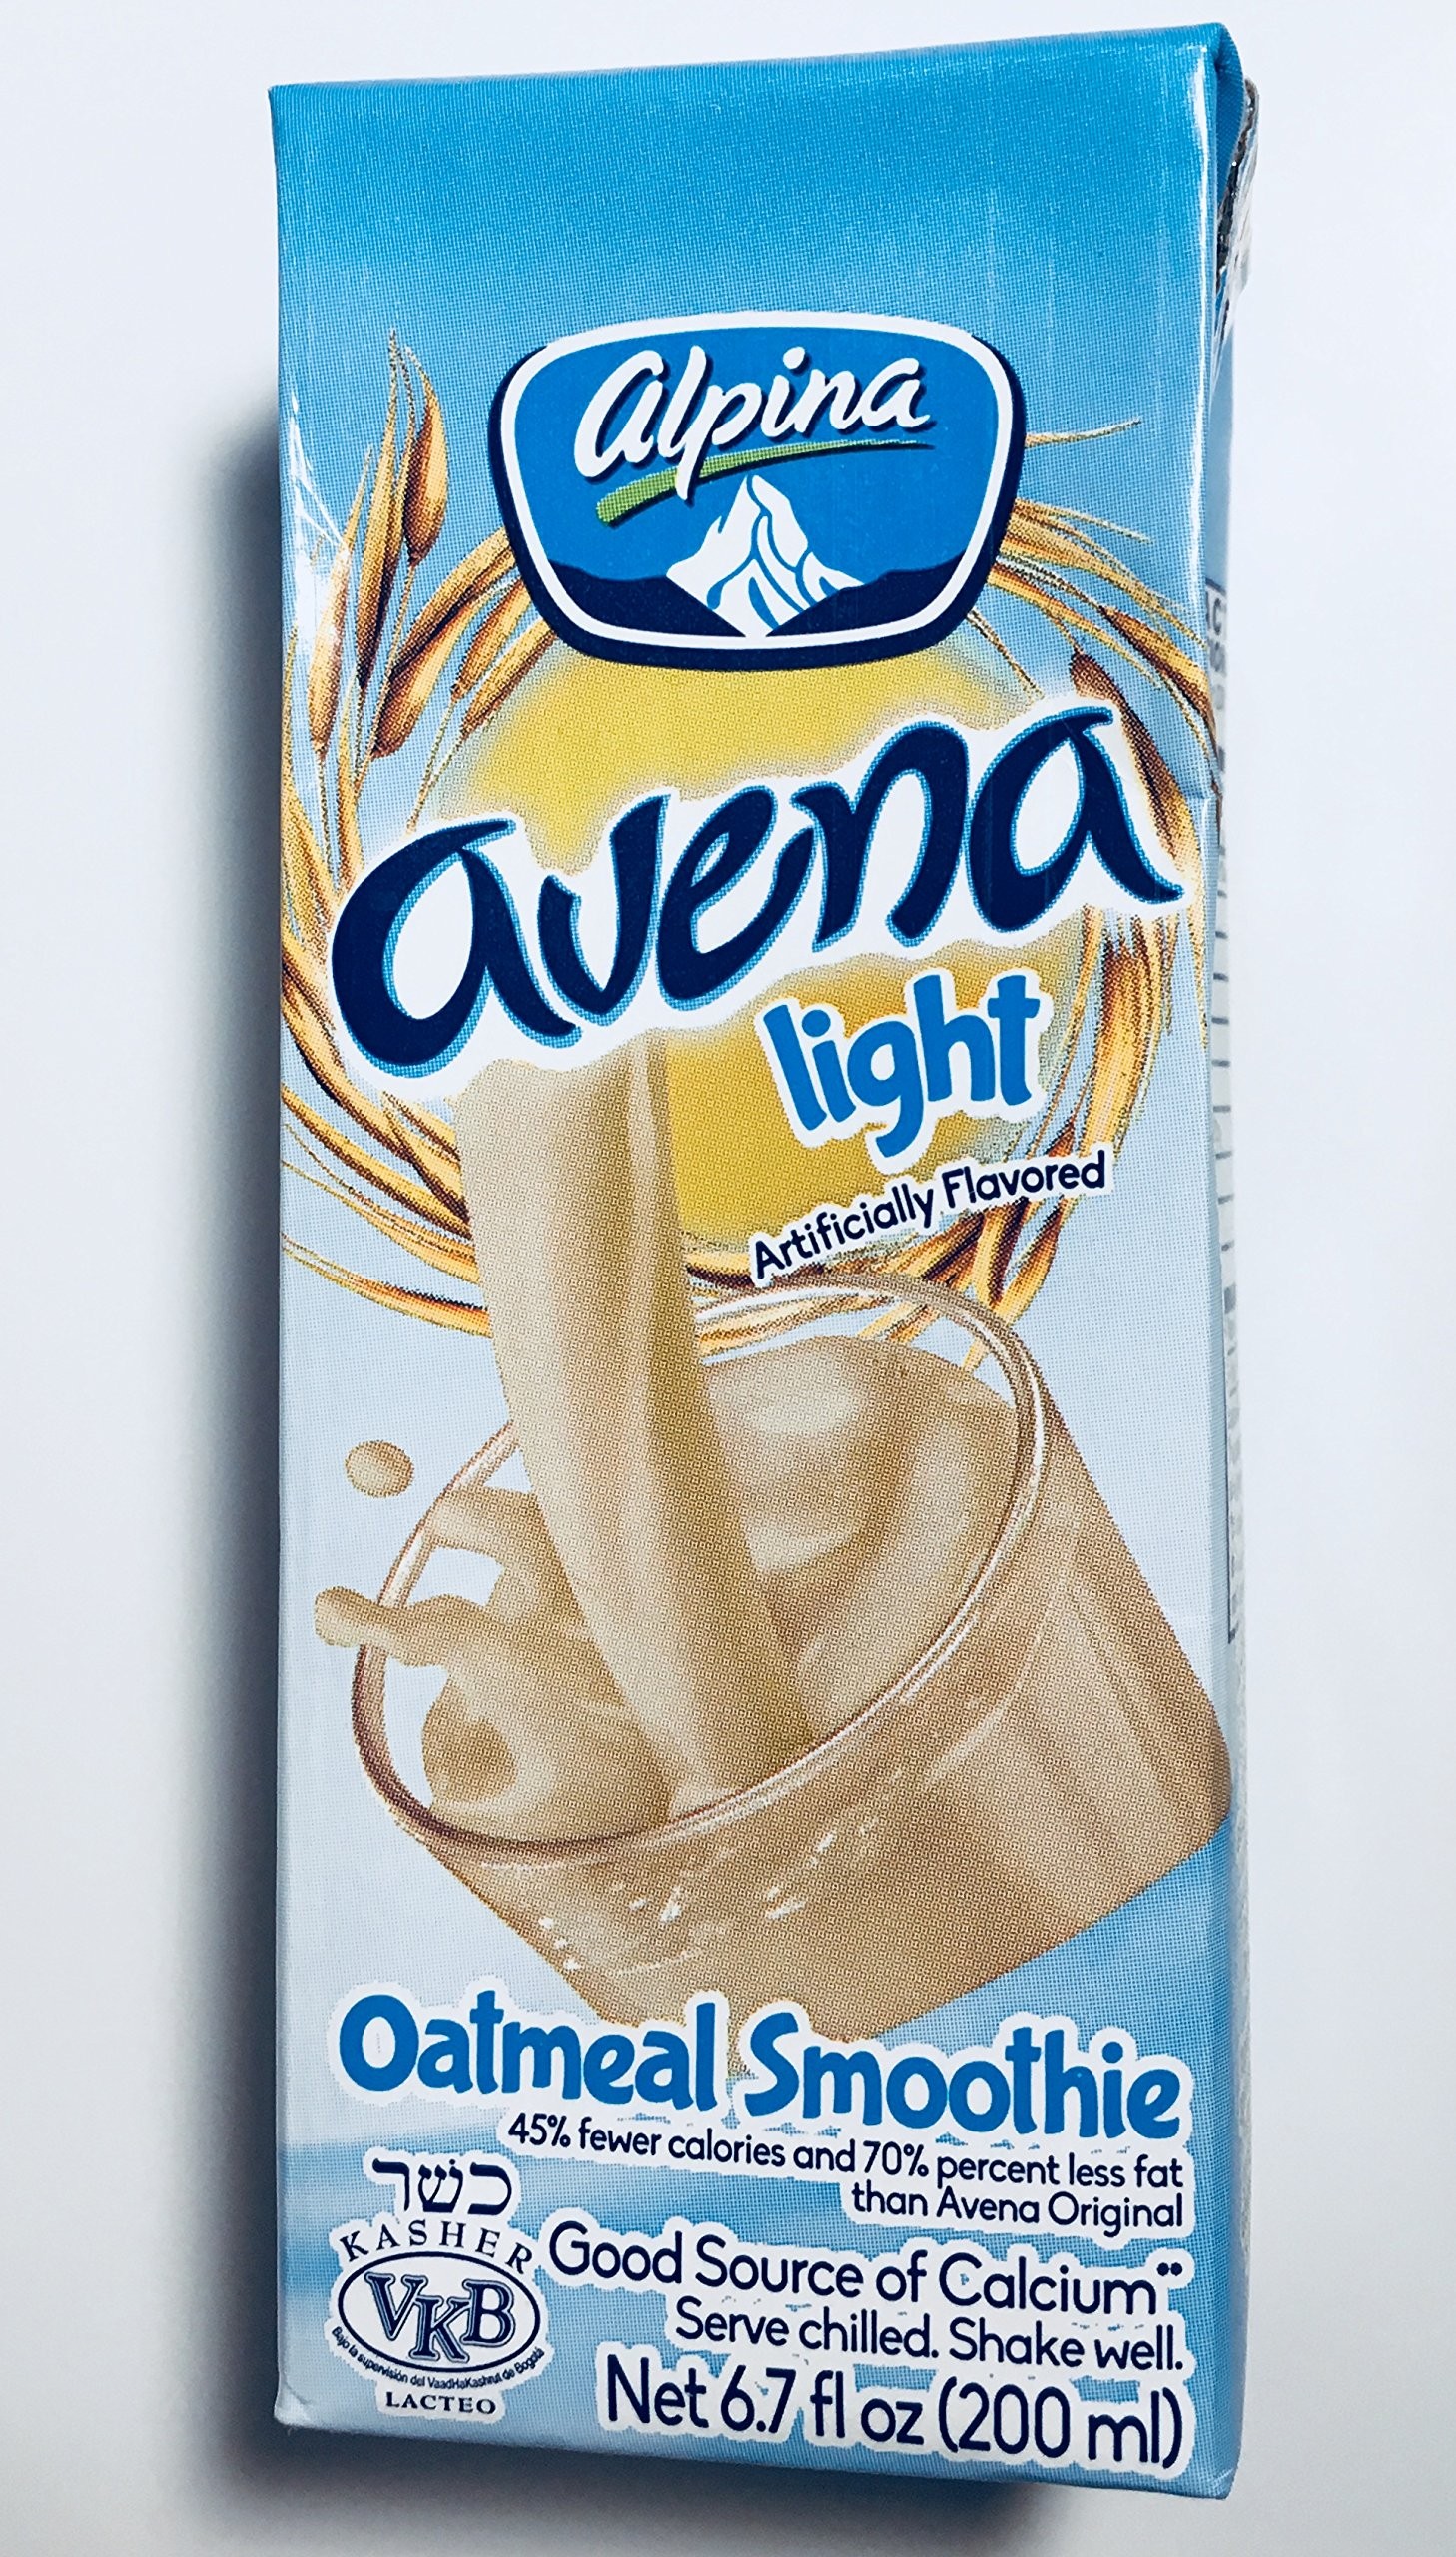 Alpina Avena Light Oatmeal Smoothie, 6.7 Oz (200 ml) Pack of 18